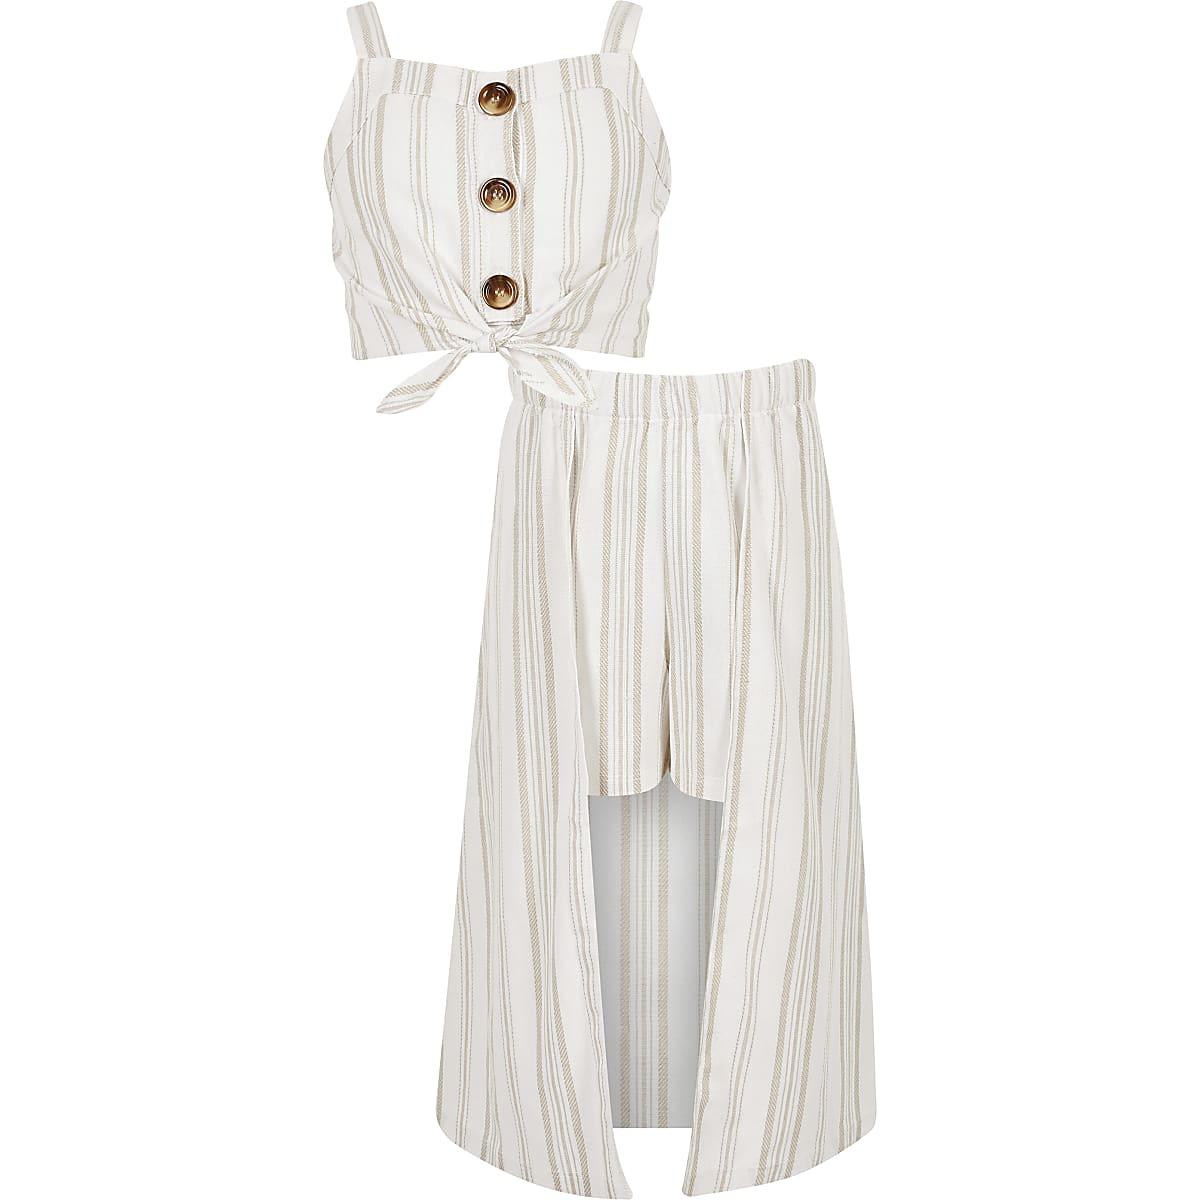 Girls beige stripe crop top and skort outfit